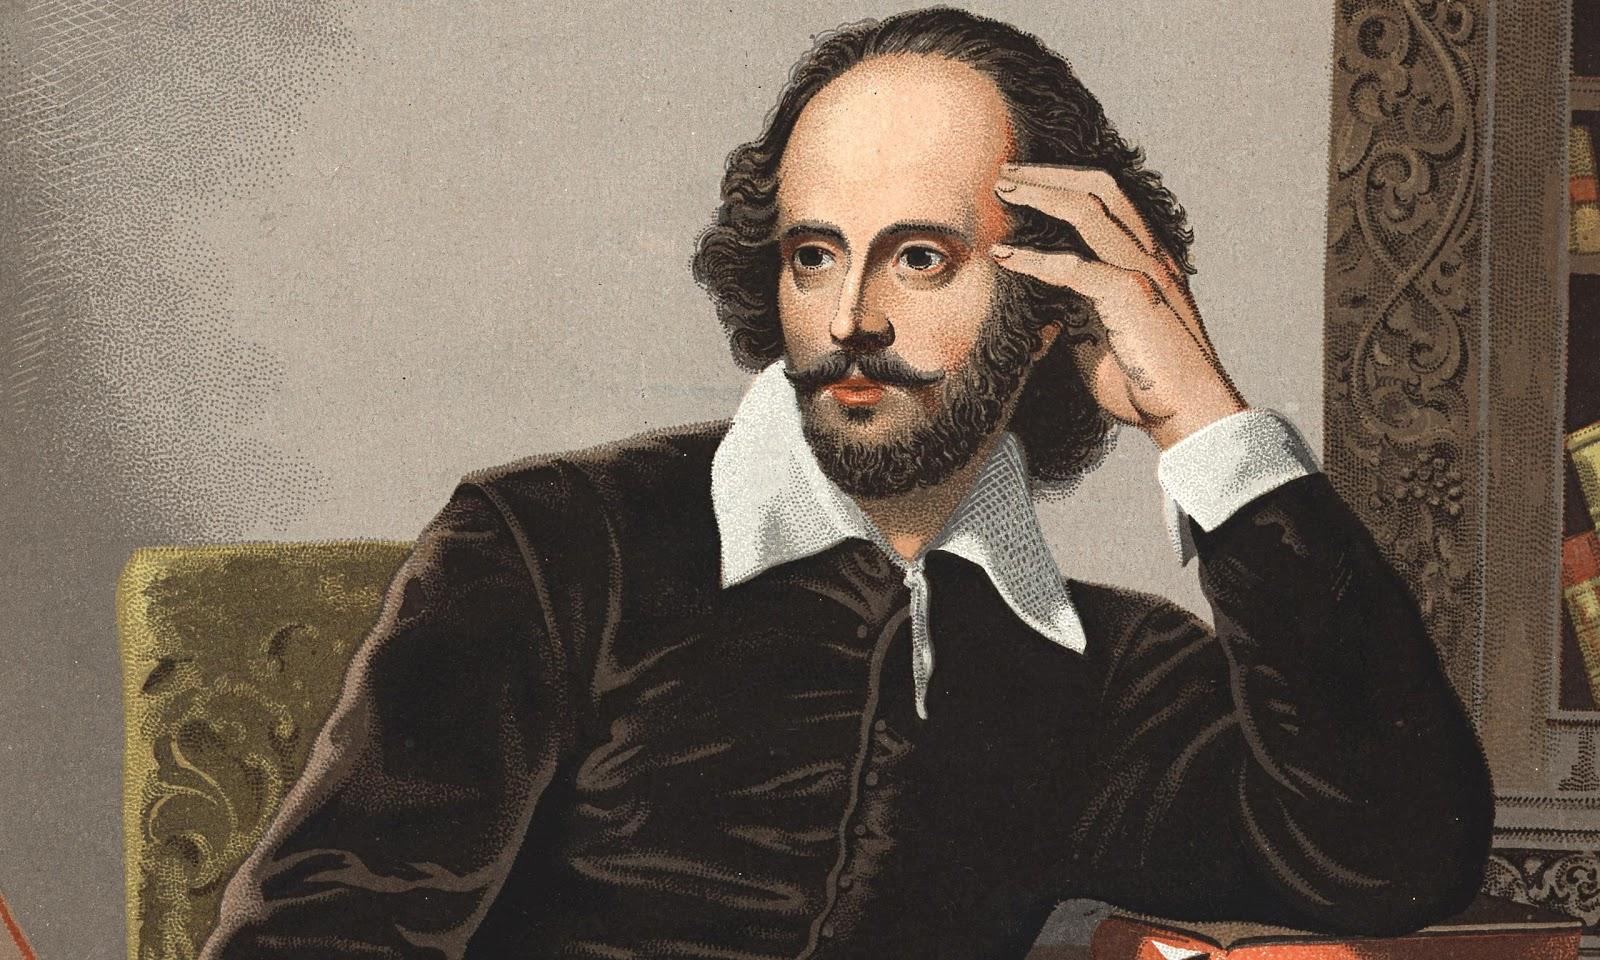 Renungan dari William Shakespeare